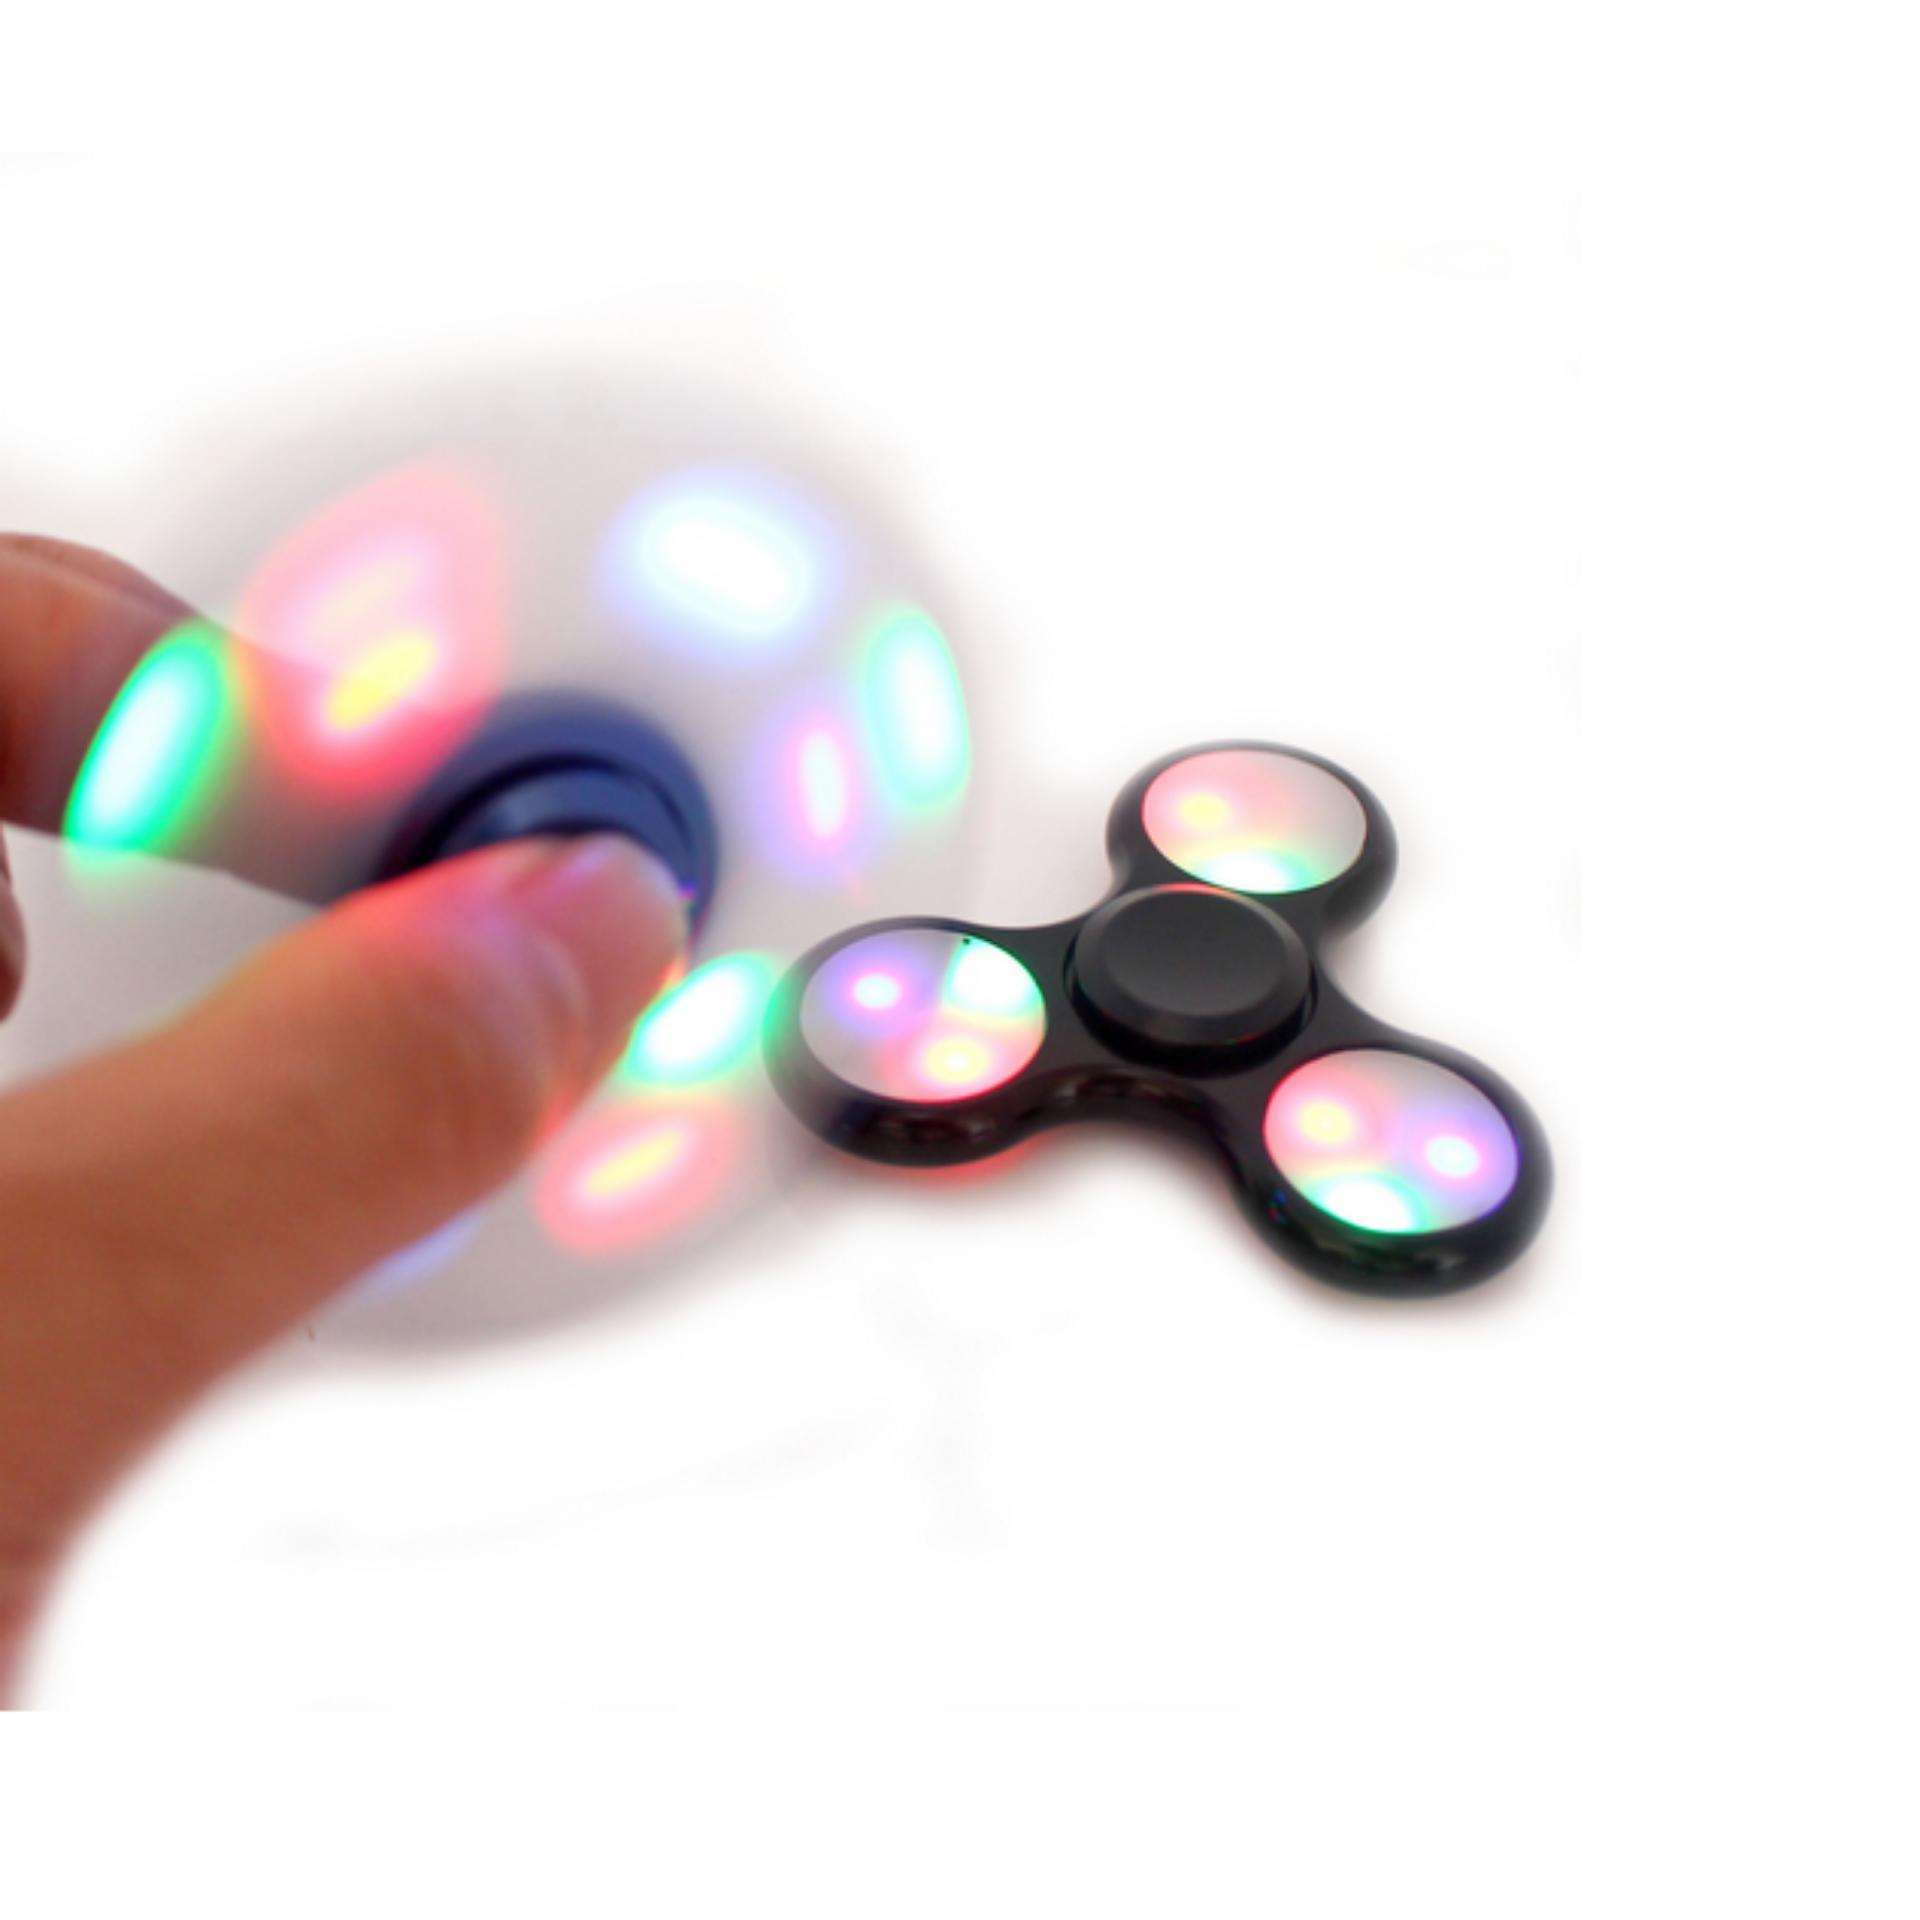 Fidget Spinner WIth LED Hand Toys Focus Games / Mainan Spinner Tangan Penghilang Kebiasan Buruk .